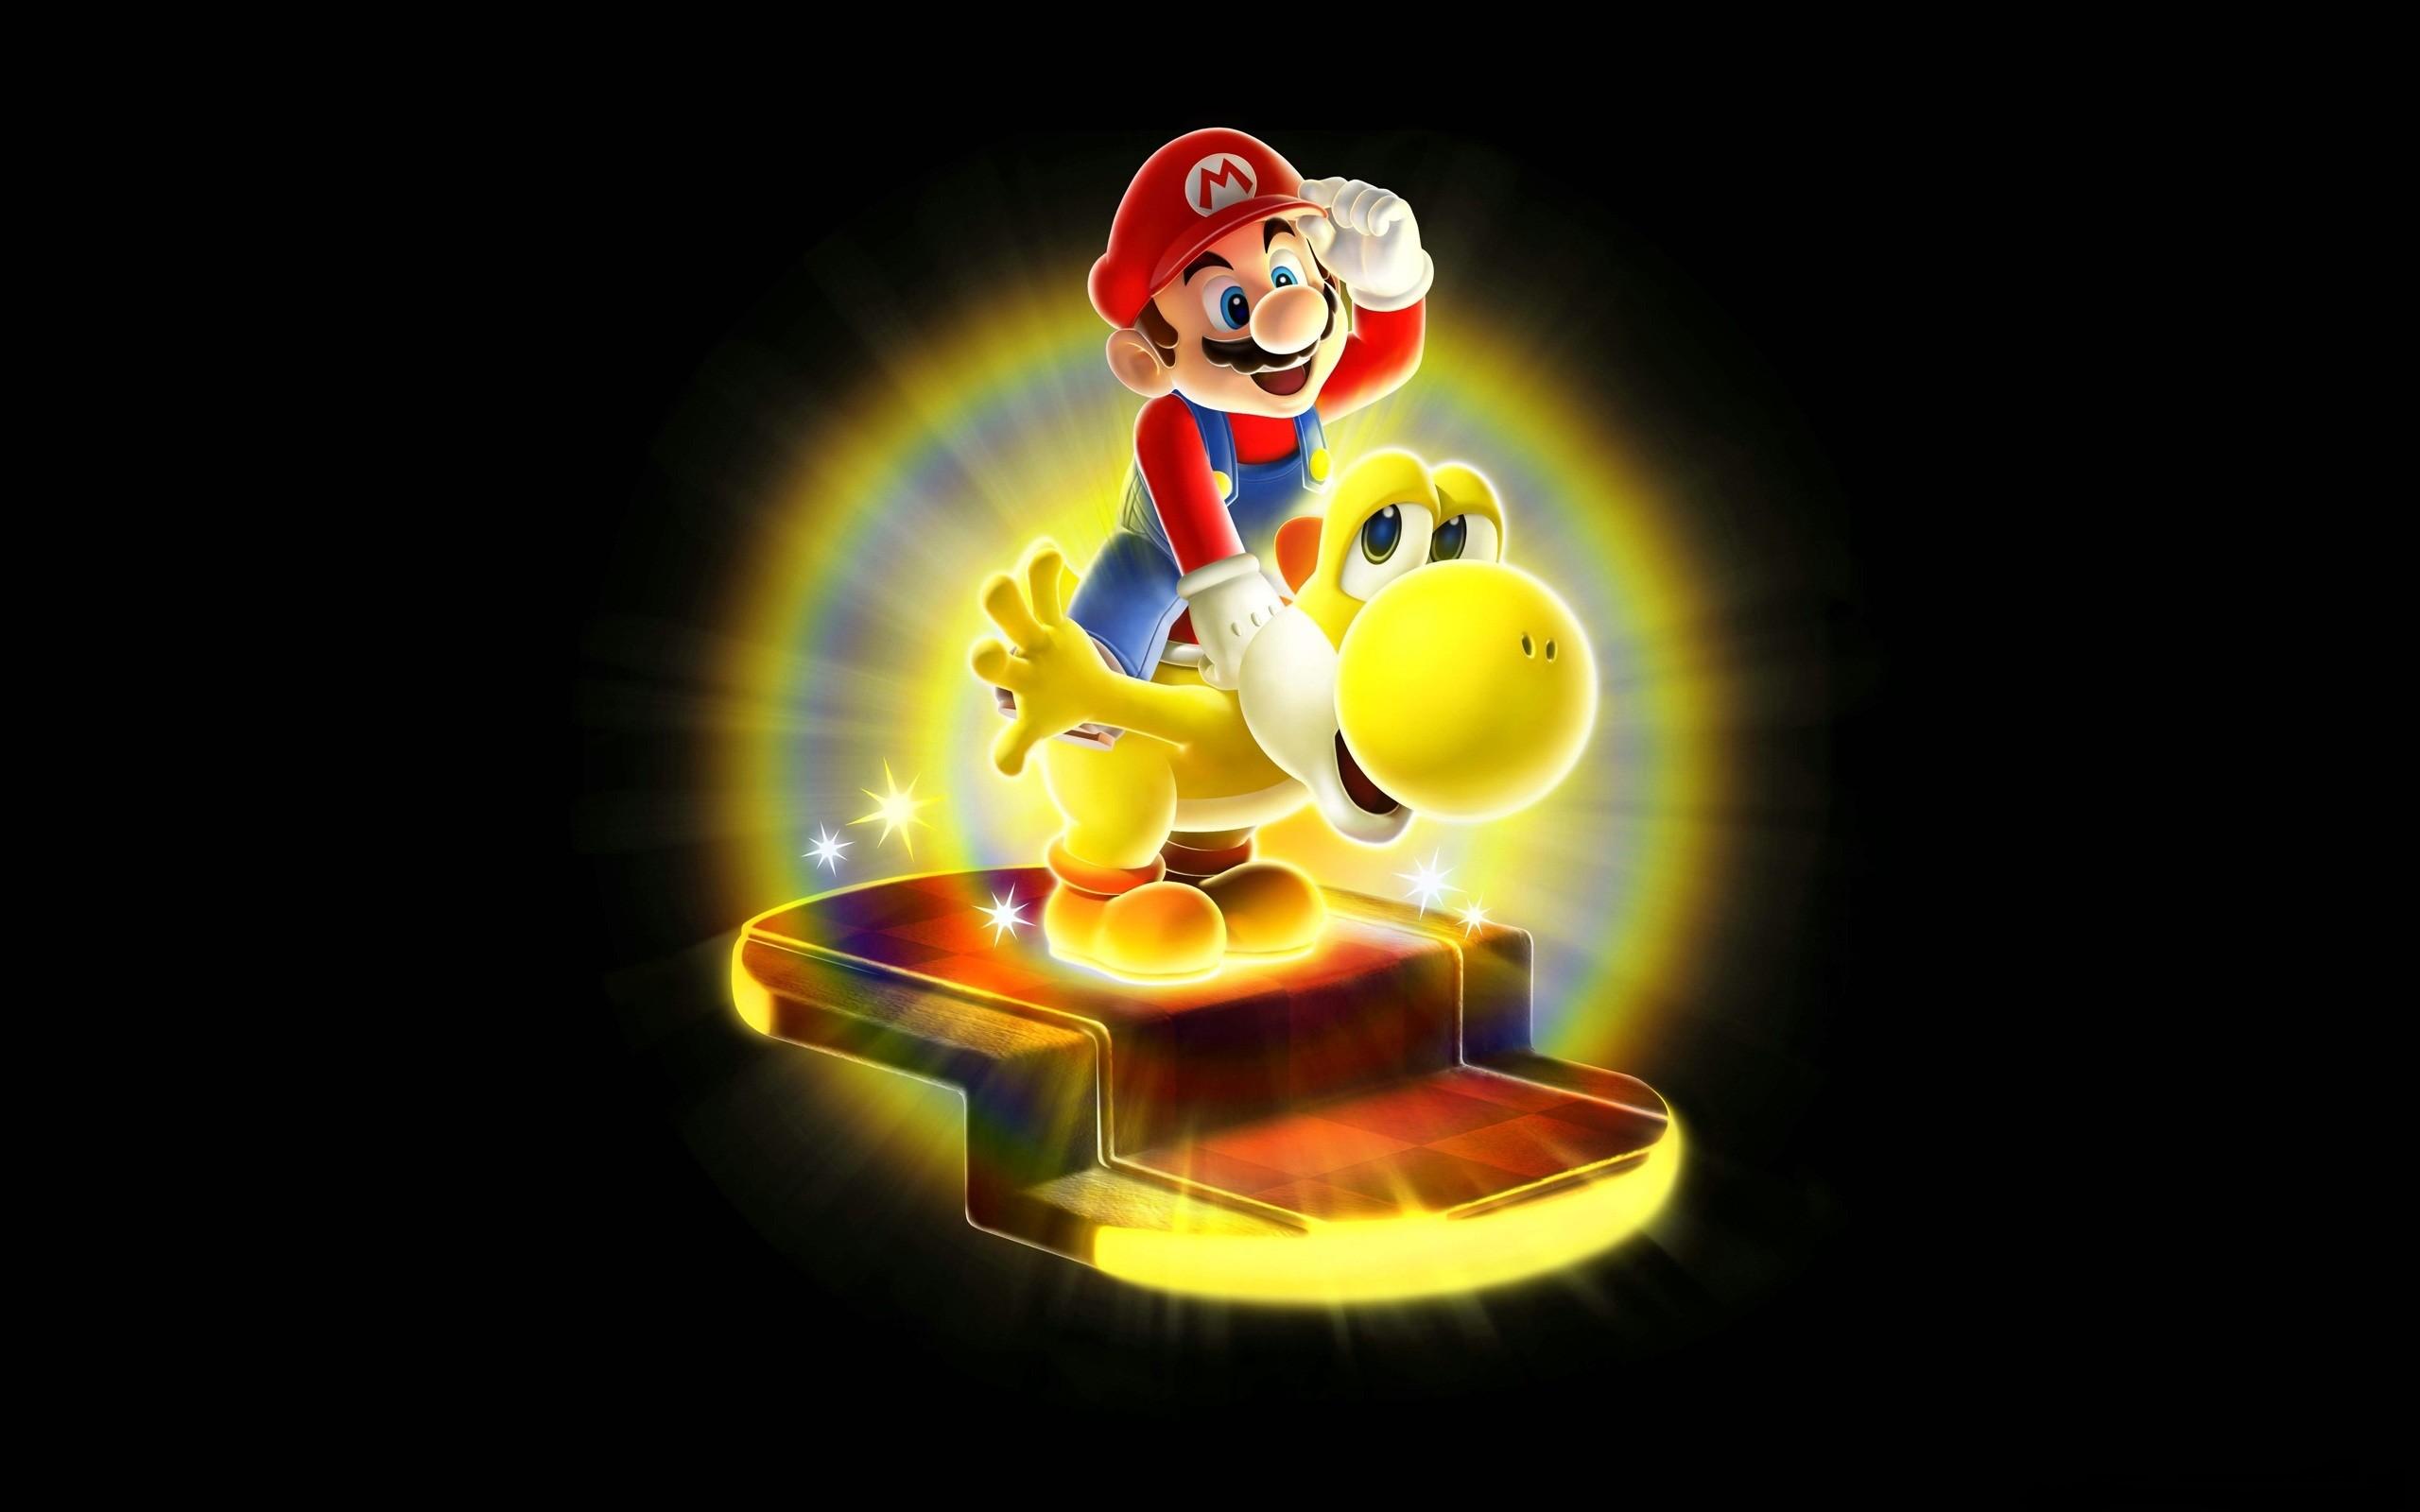 Video Game – Super Mario Bros. Wallpaper